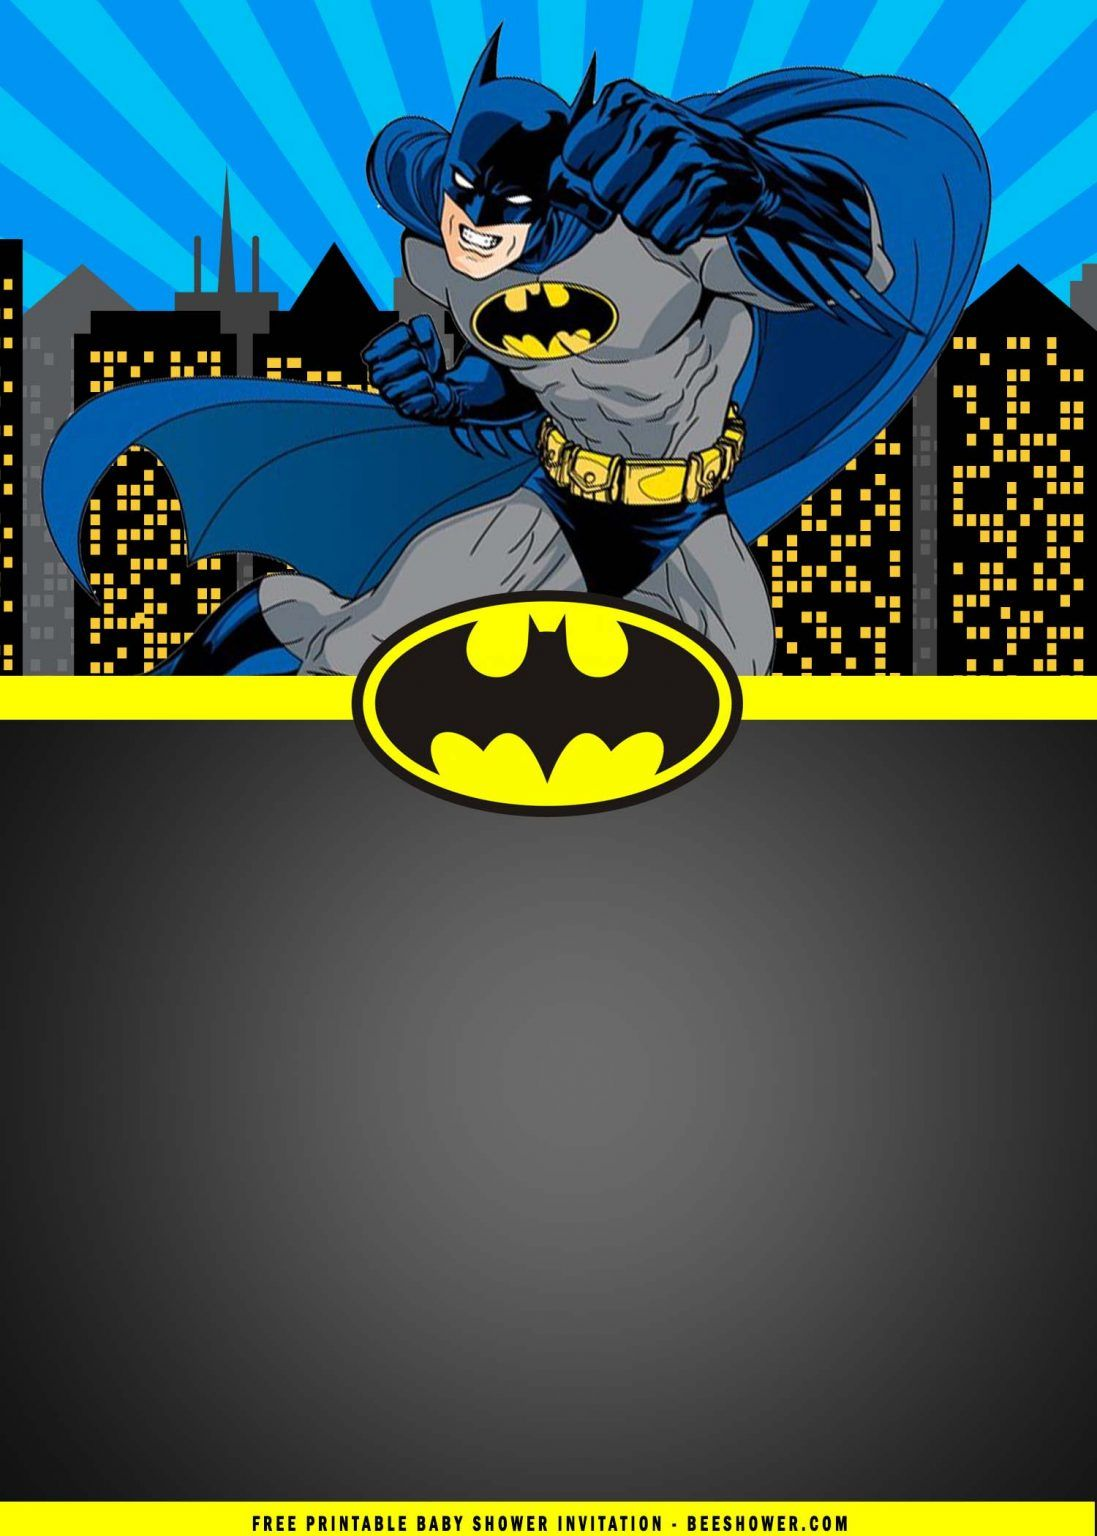 Free Printable Batman Birthday Party Invitation Templates Free Printable Baby Shower Invitations Batman Invitations Batman Birthday Party Batman Birthday